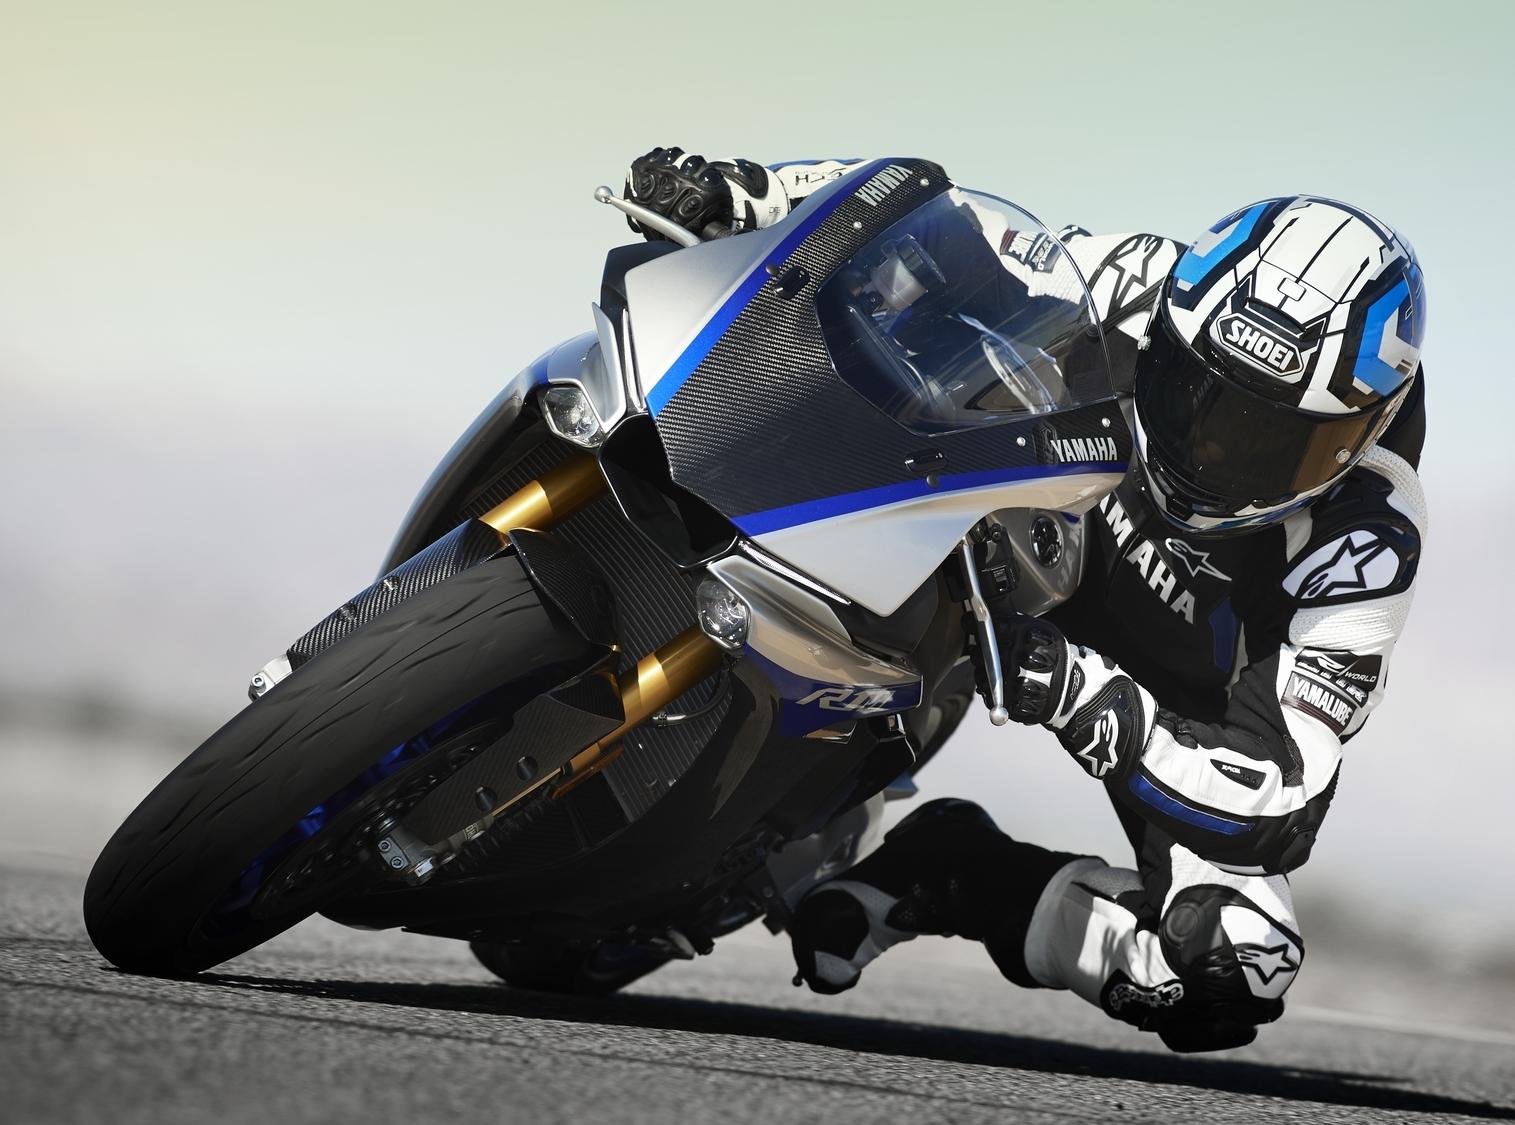 2019-Yamaha-YZF1000R1SPL-EU-Silver_Blu_C